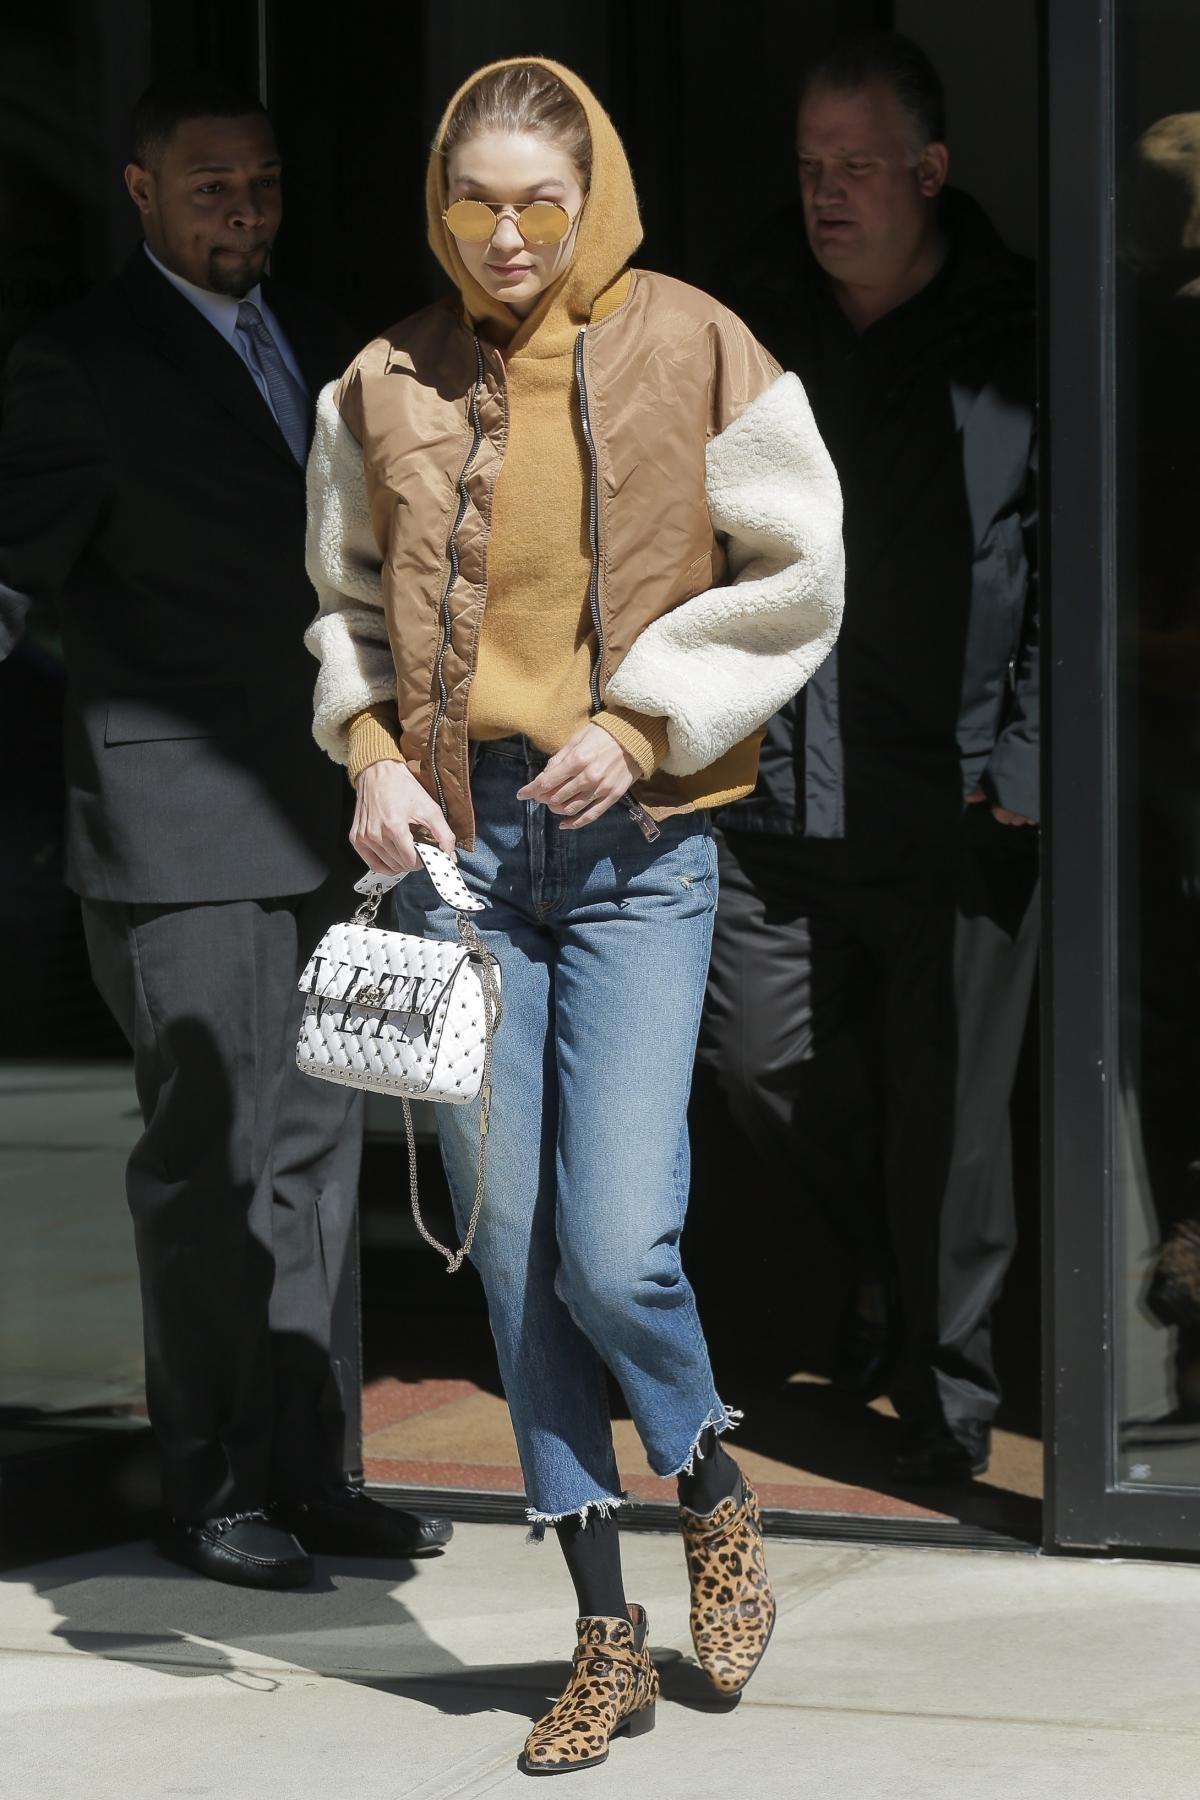 1d3b5b19a0b Gigi Hadid wearing Linda Farrow 427 C1 Sunglasses